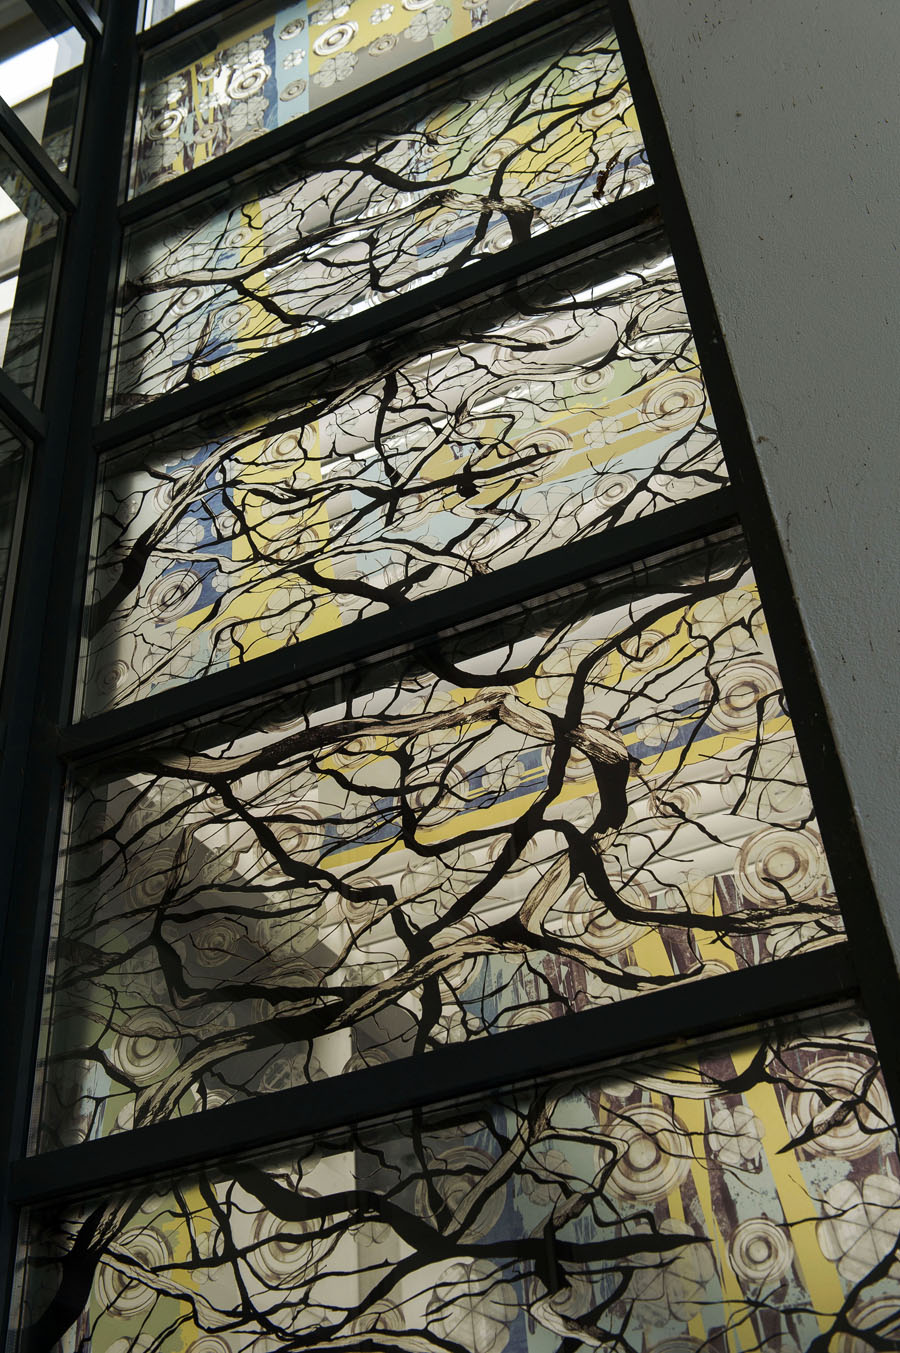 Detail of Perspex window installation